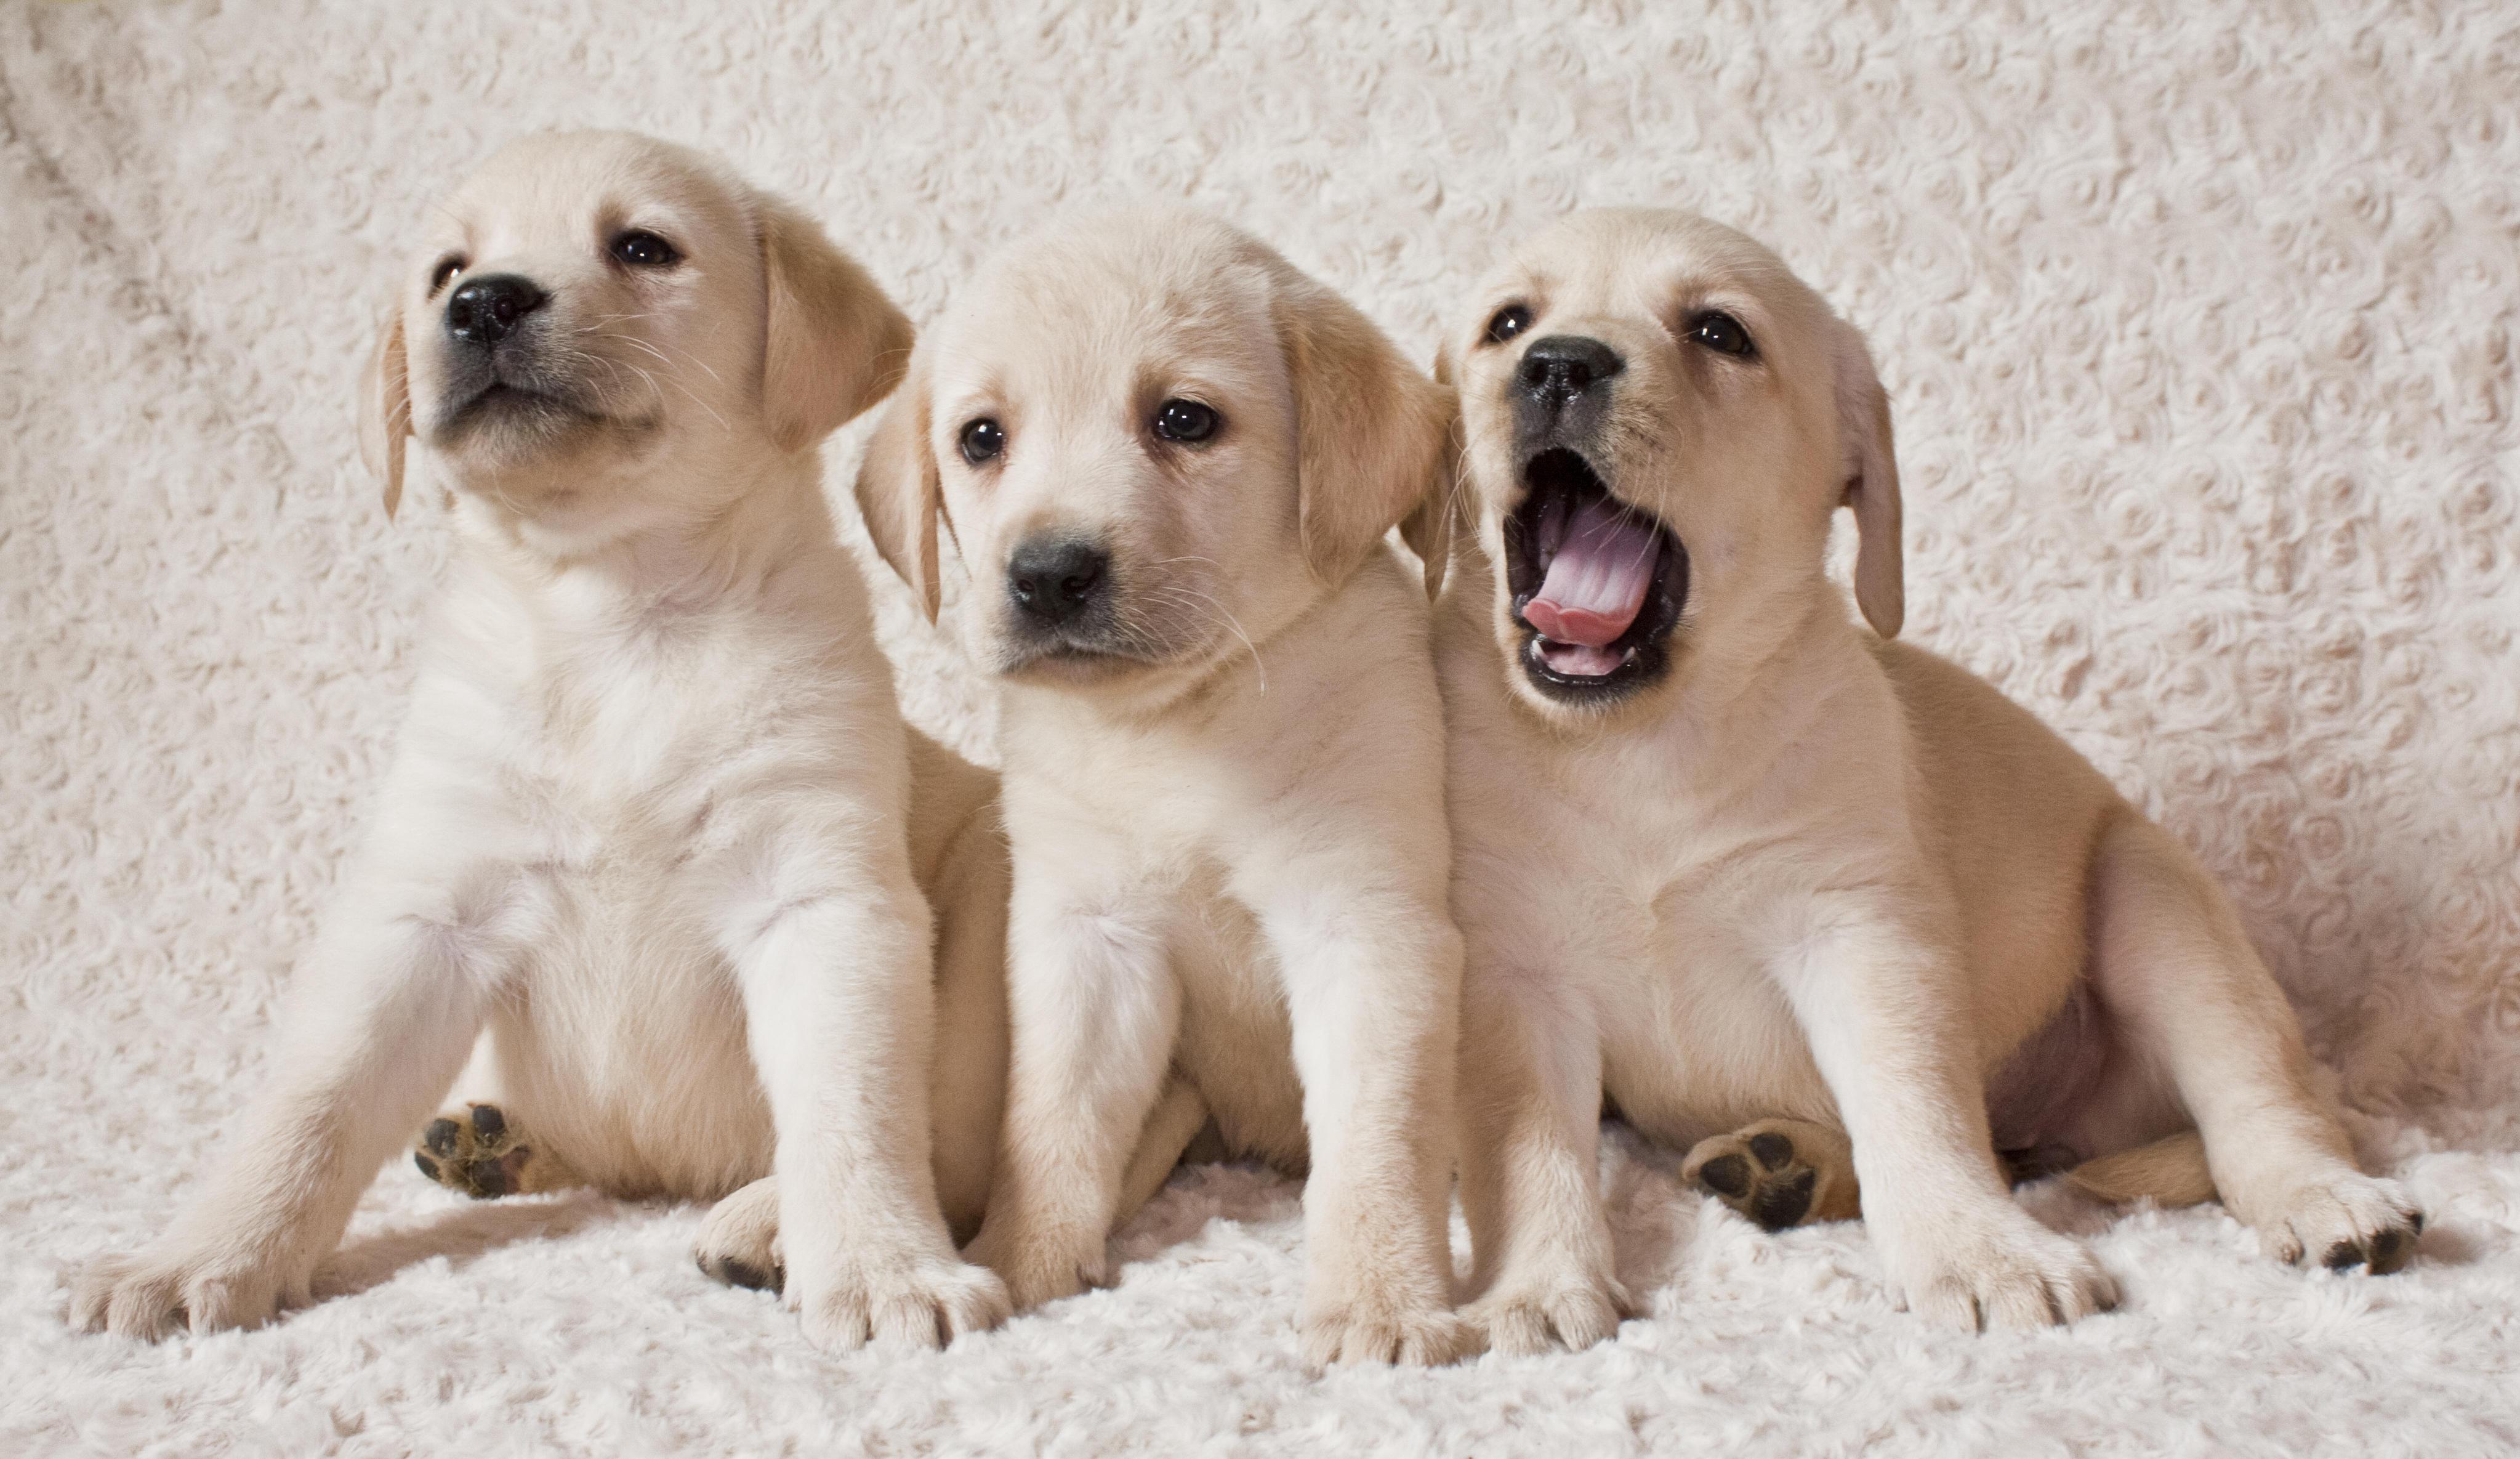 Обои Labrador puppies, Лабрадор, Щенки лабрадора, щенки